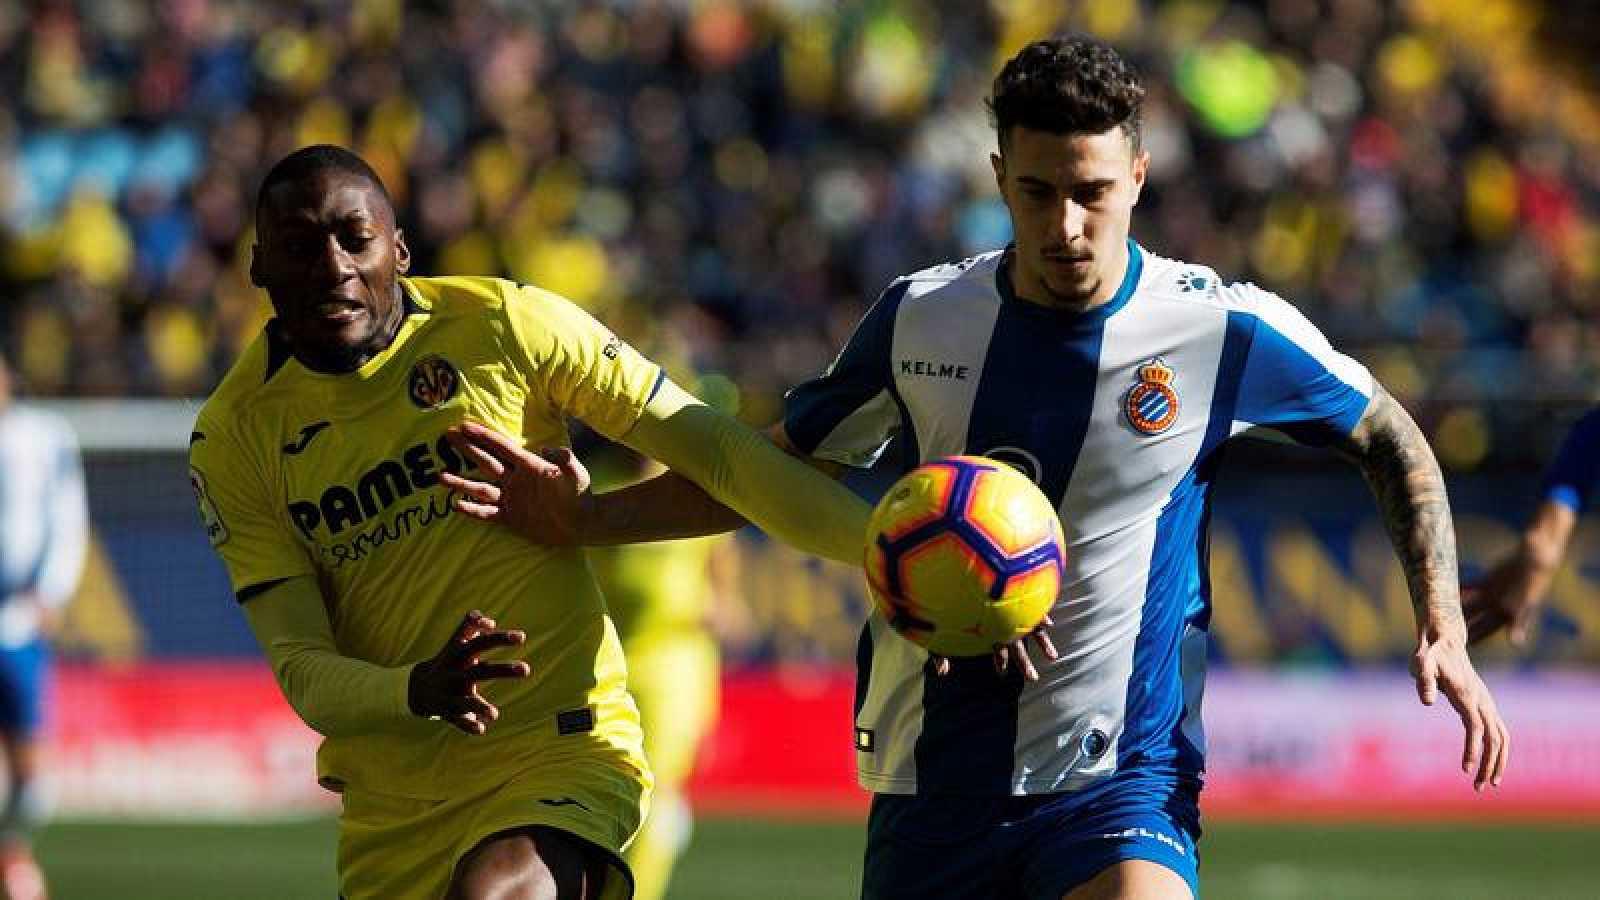 El Espanyol neutraliza el regreso de Calleja al Villarreal